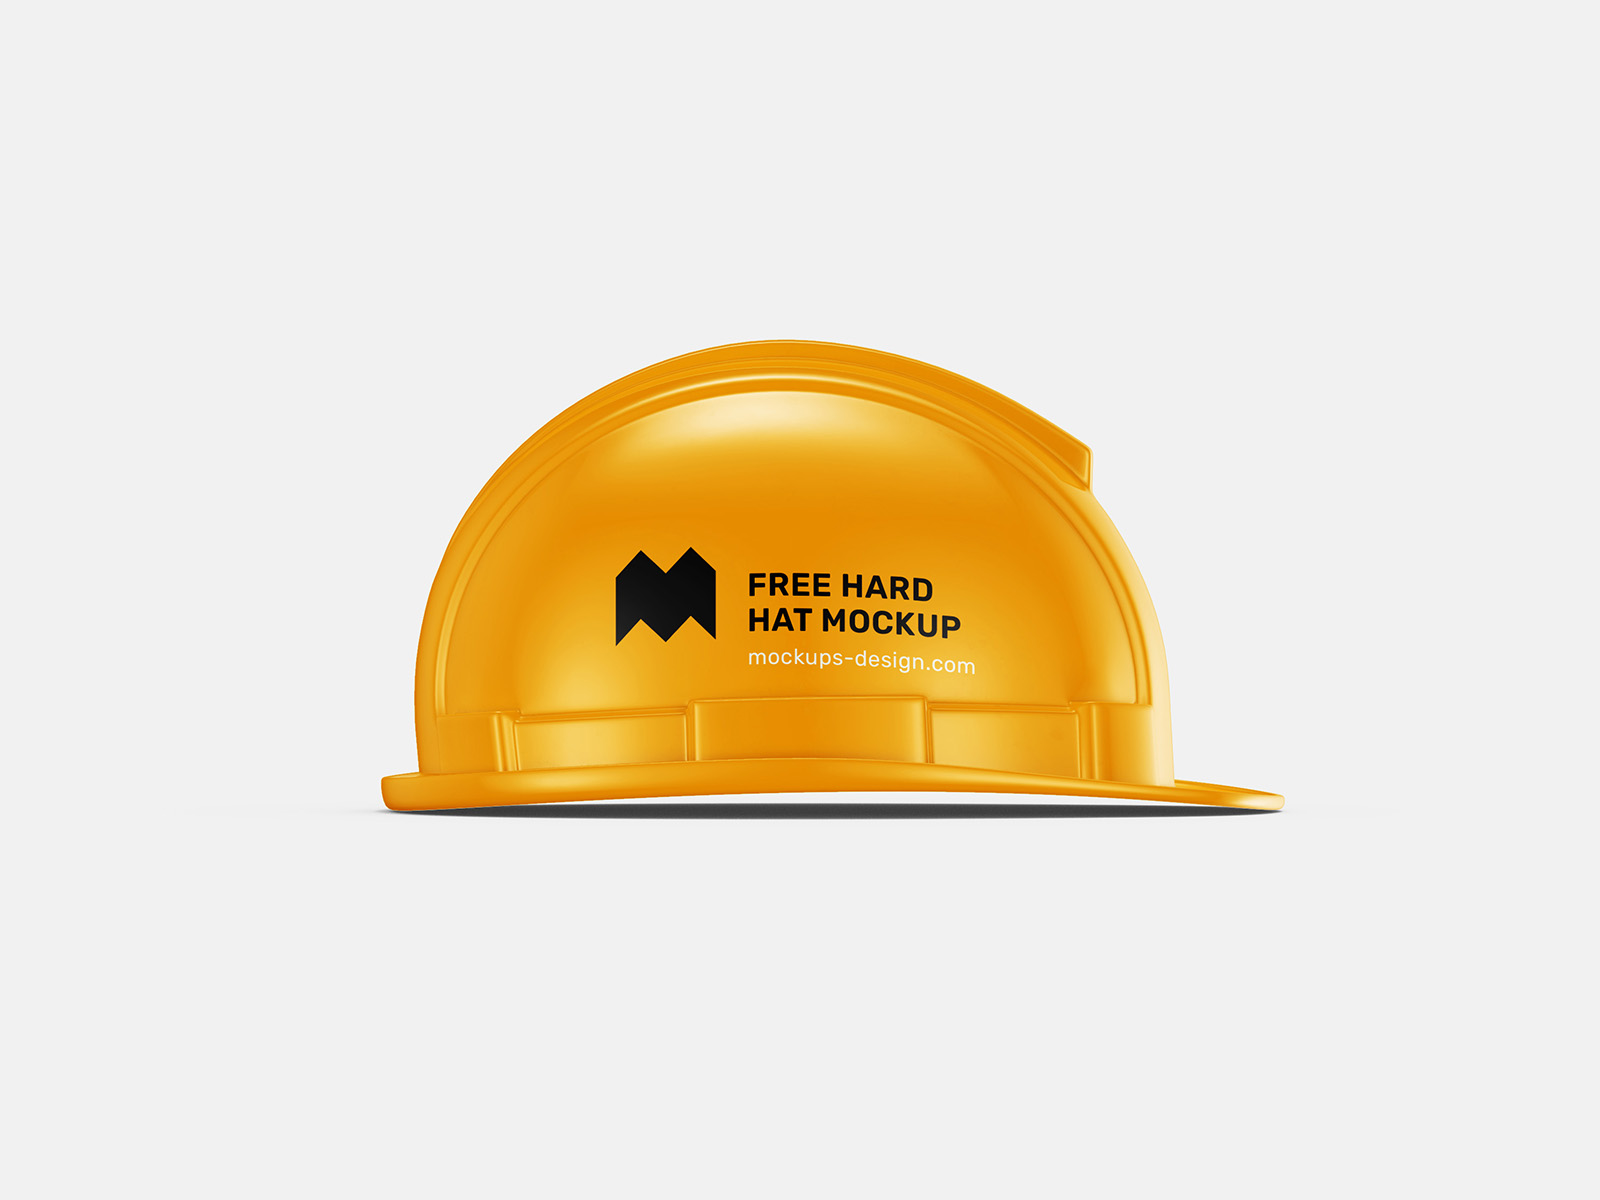 Free hard hat mockup